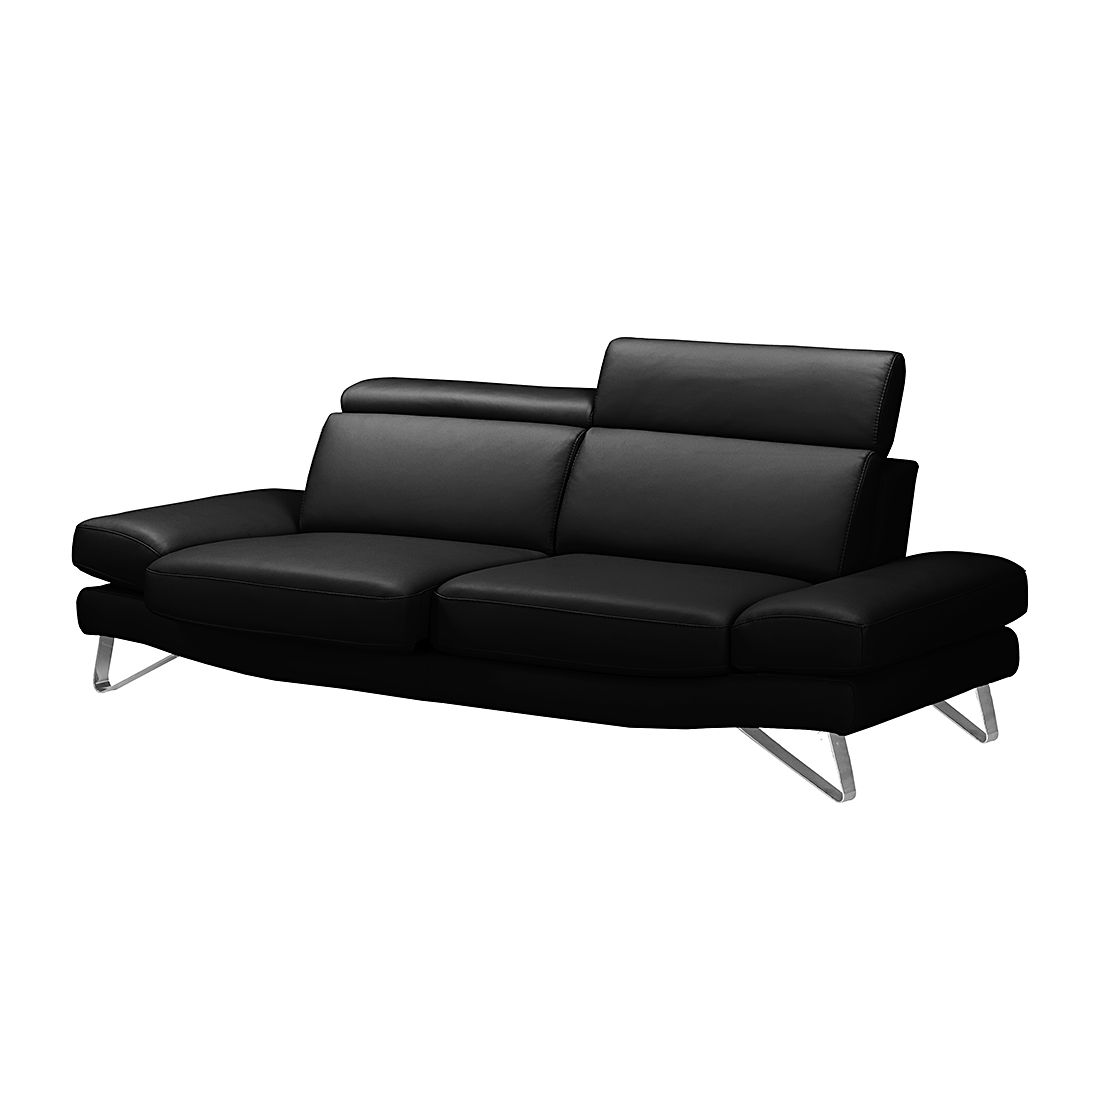 Sofa Finnley (3-Sitzer) - Echtleder - Schwarz, loftscape